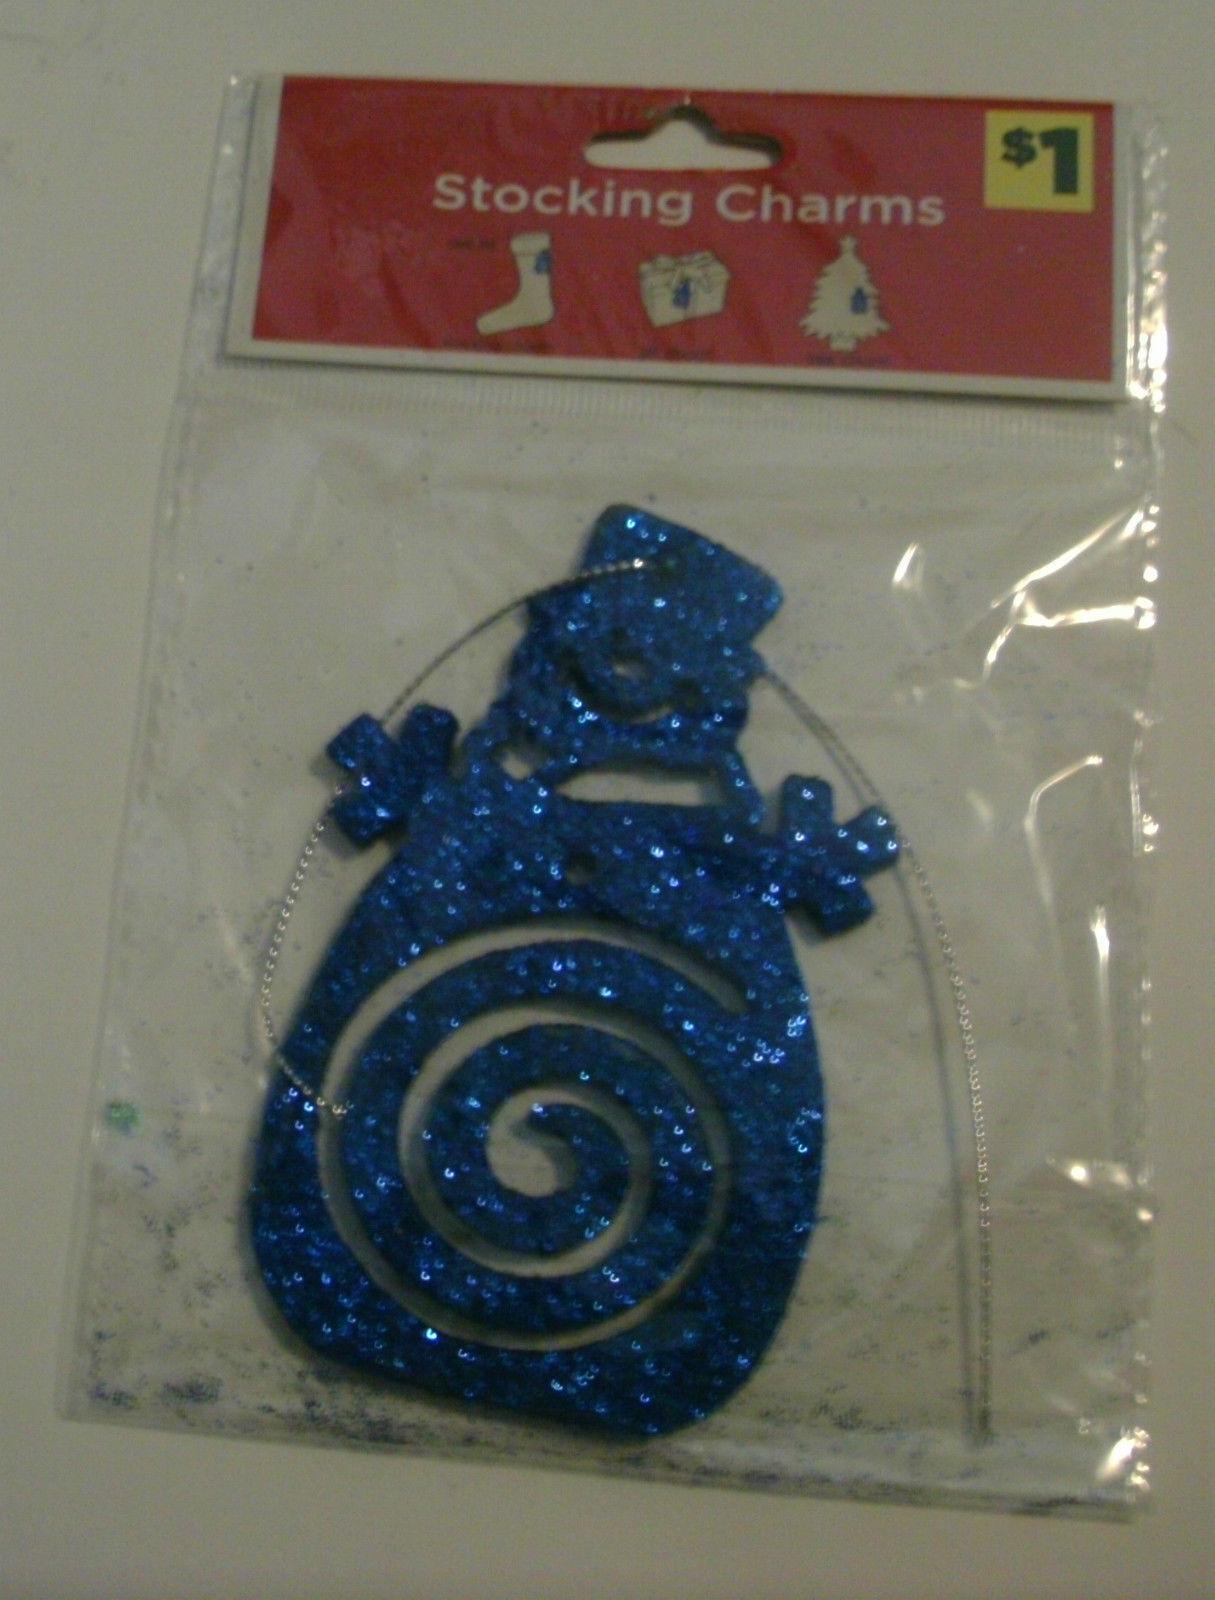 2 Stocking Charms Gray Glitter Reindeer & Blue Glitter Snowman